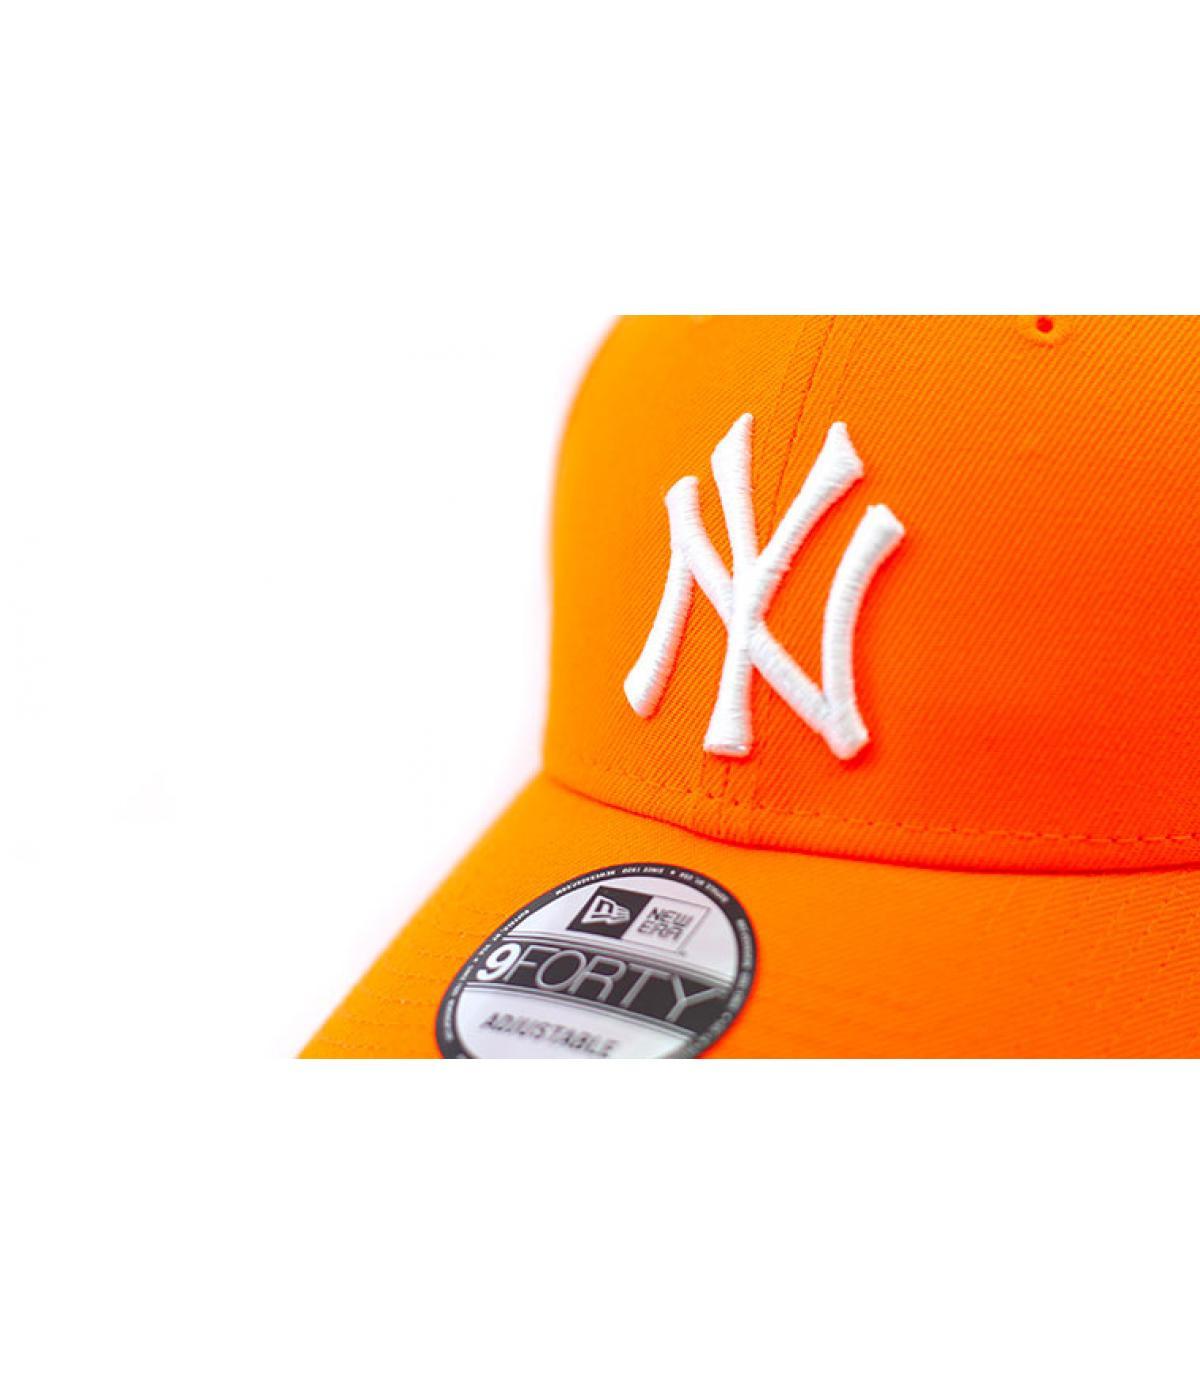 Details Cap NY 9forty neon orange white - Abbildung 3